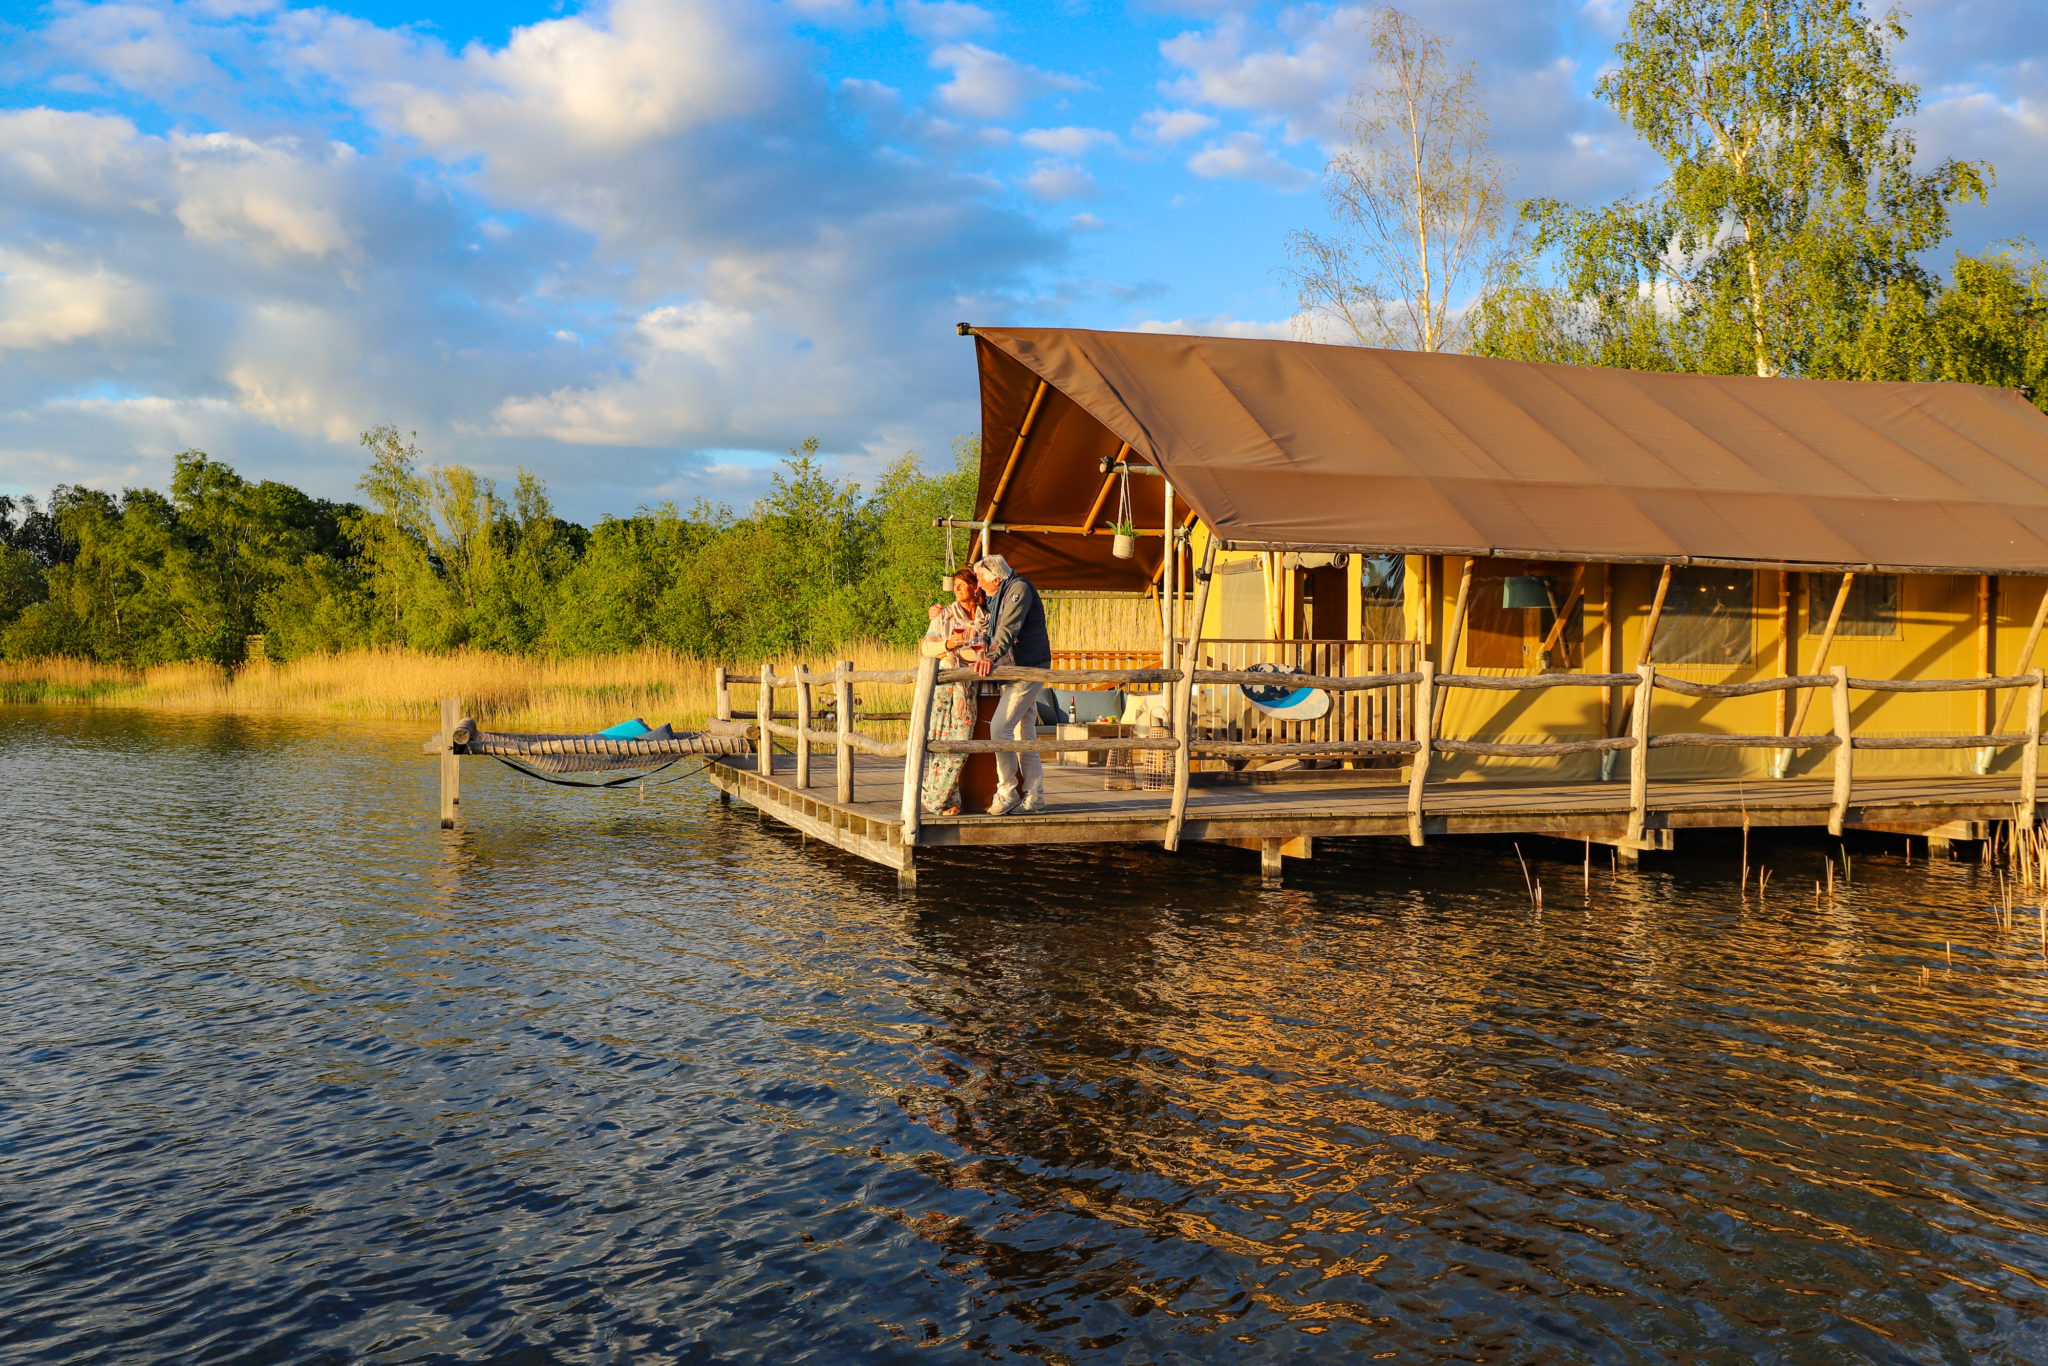 YALA_Sunshine_glamping_lodge_view_lake_luxury_canvas_lodges